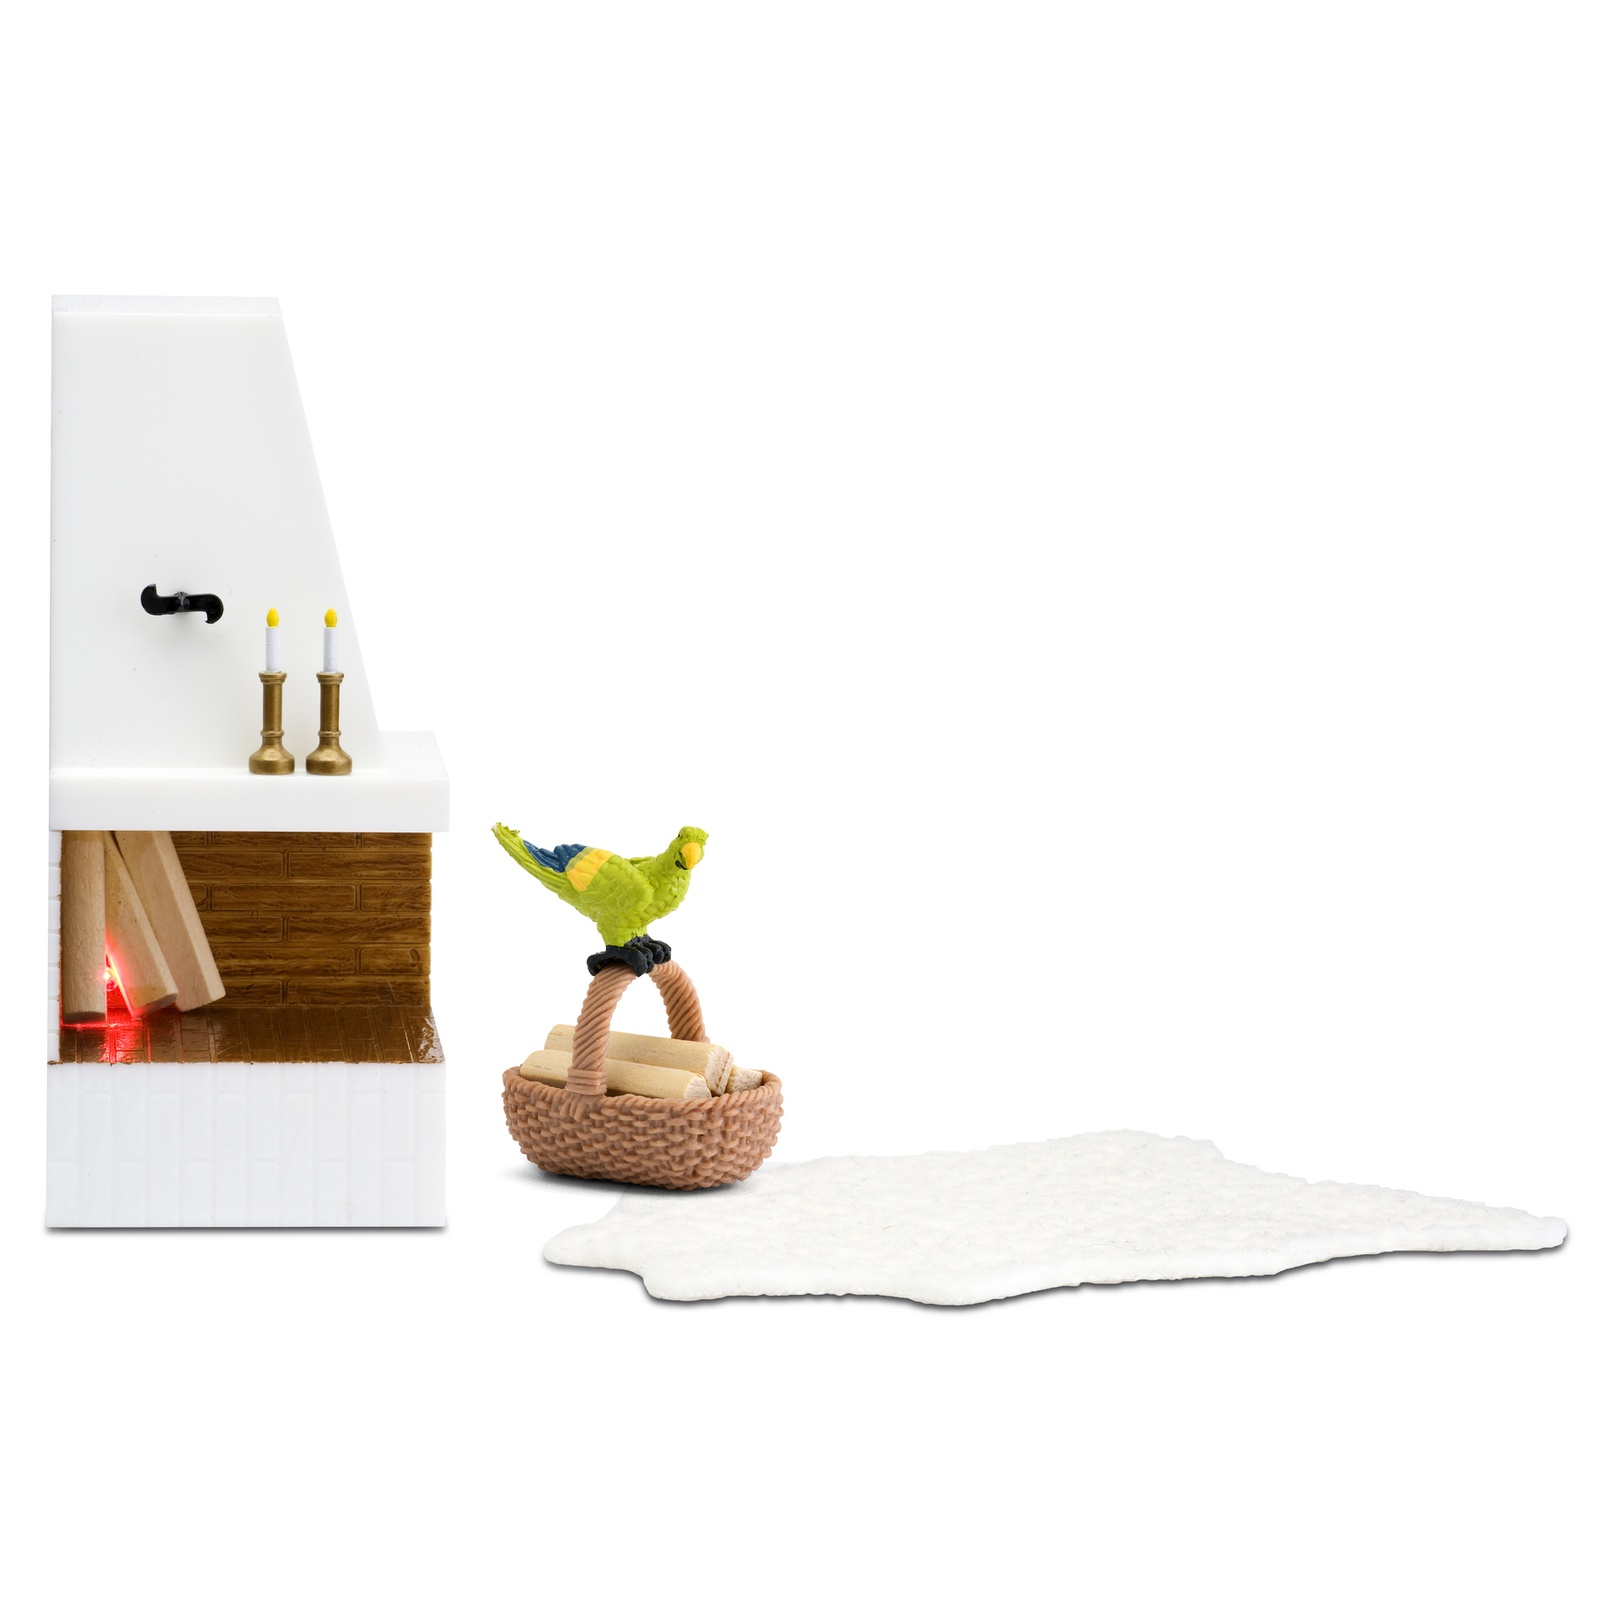 Мебель для кукол Lundby Смоланд, Камин с декором кукольная мебель lundby смоланд обеденный уголок lb 60209600